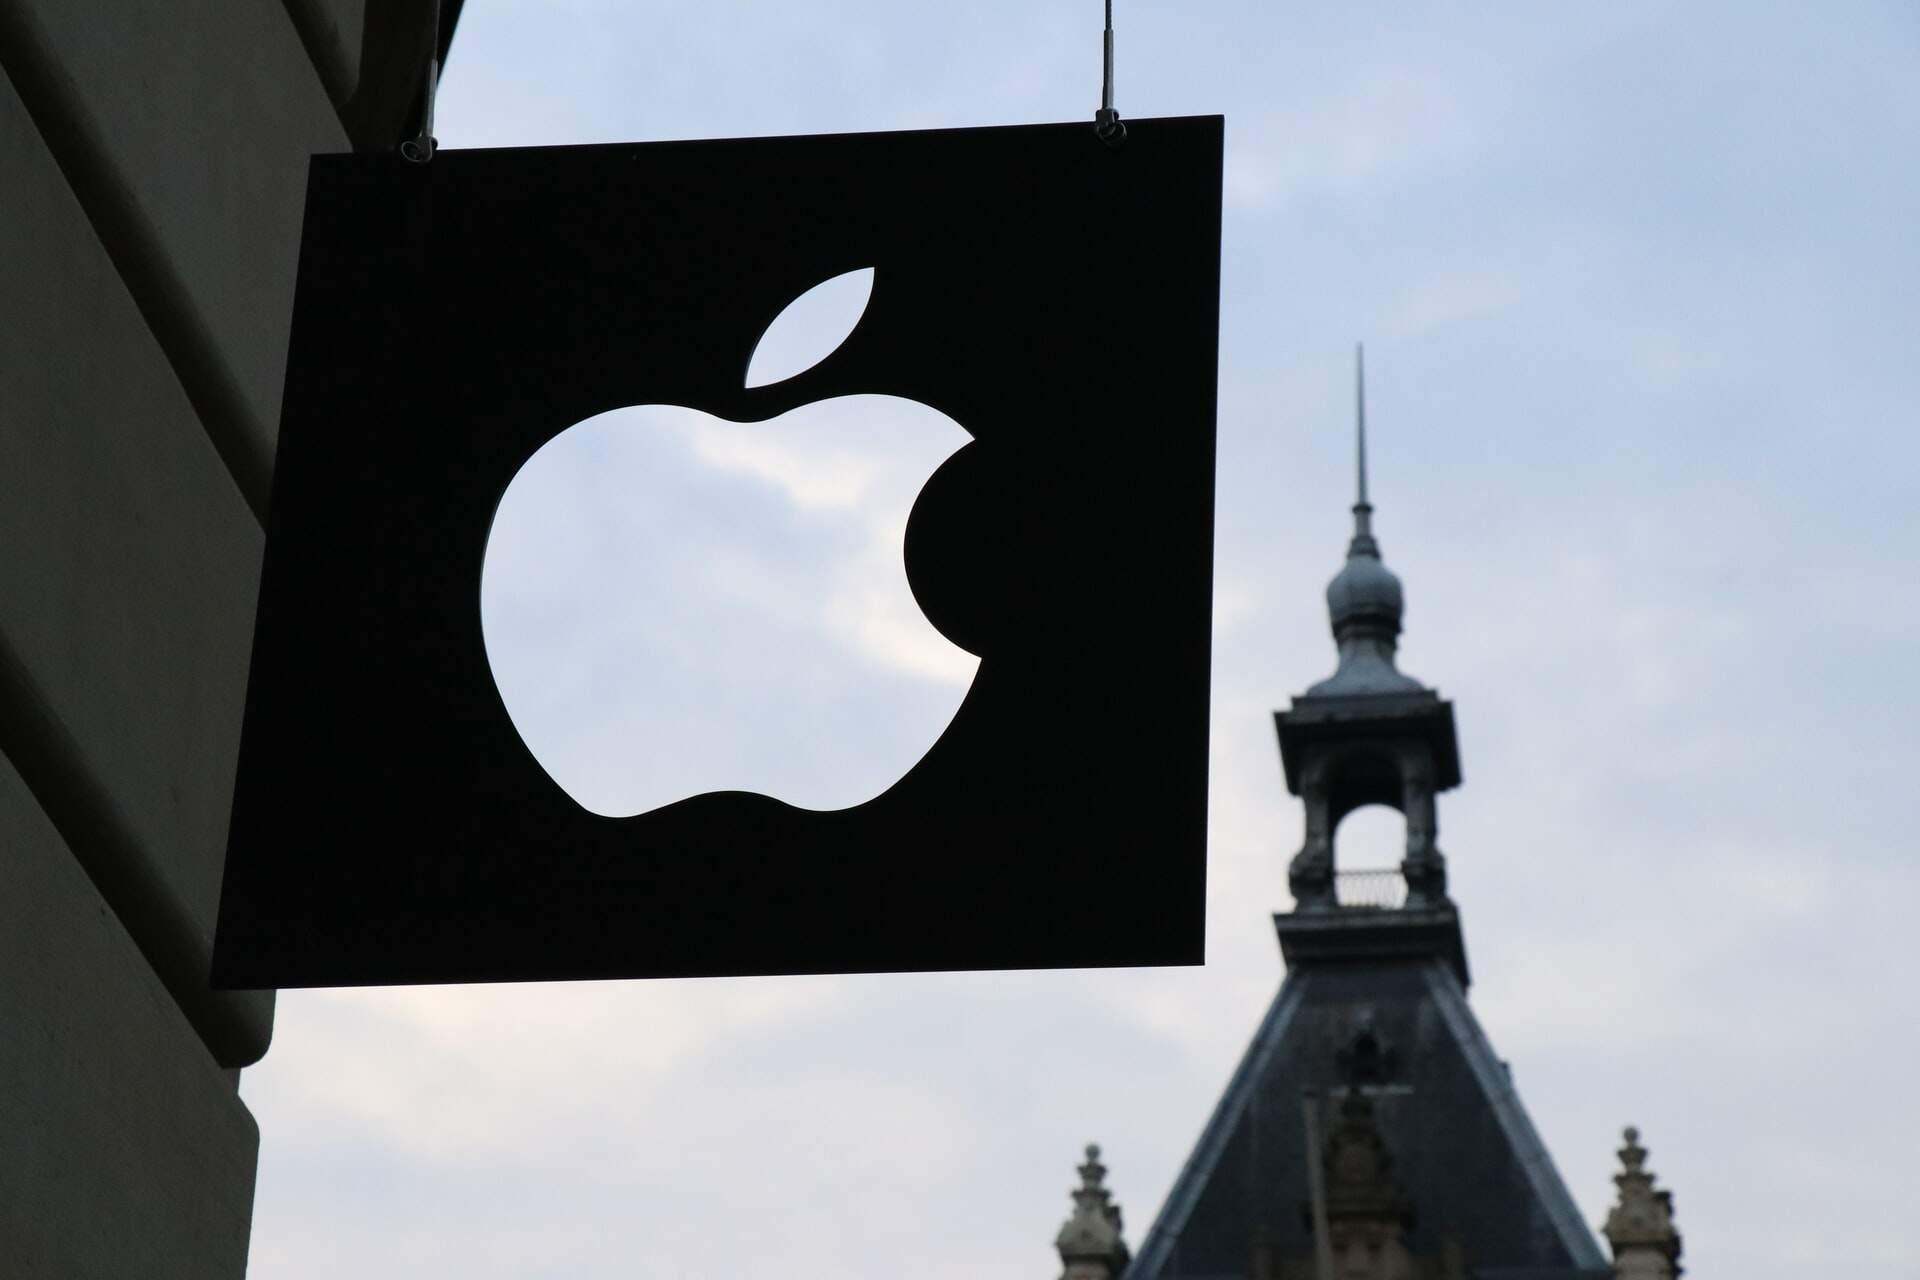 Swift正式登录Windows:苹果跨平台语言值几钱?